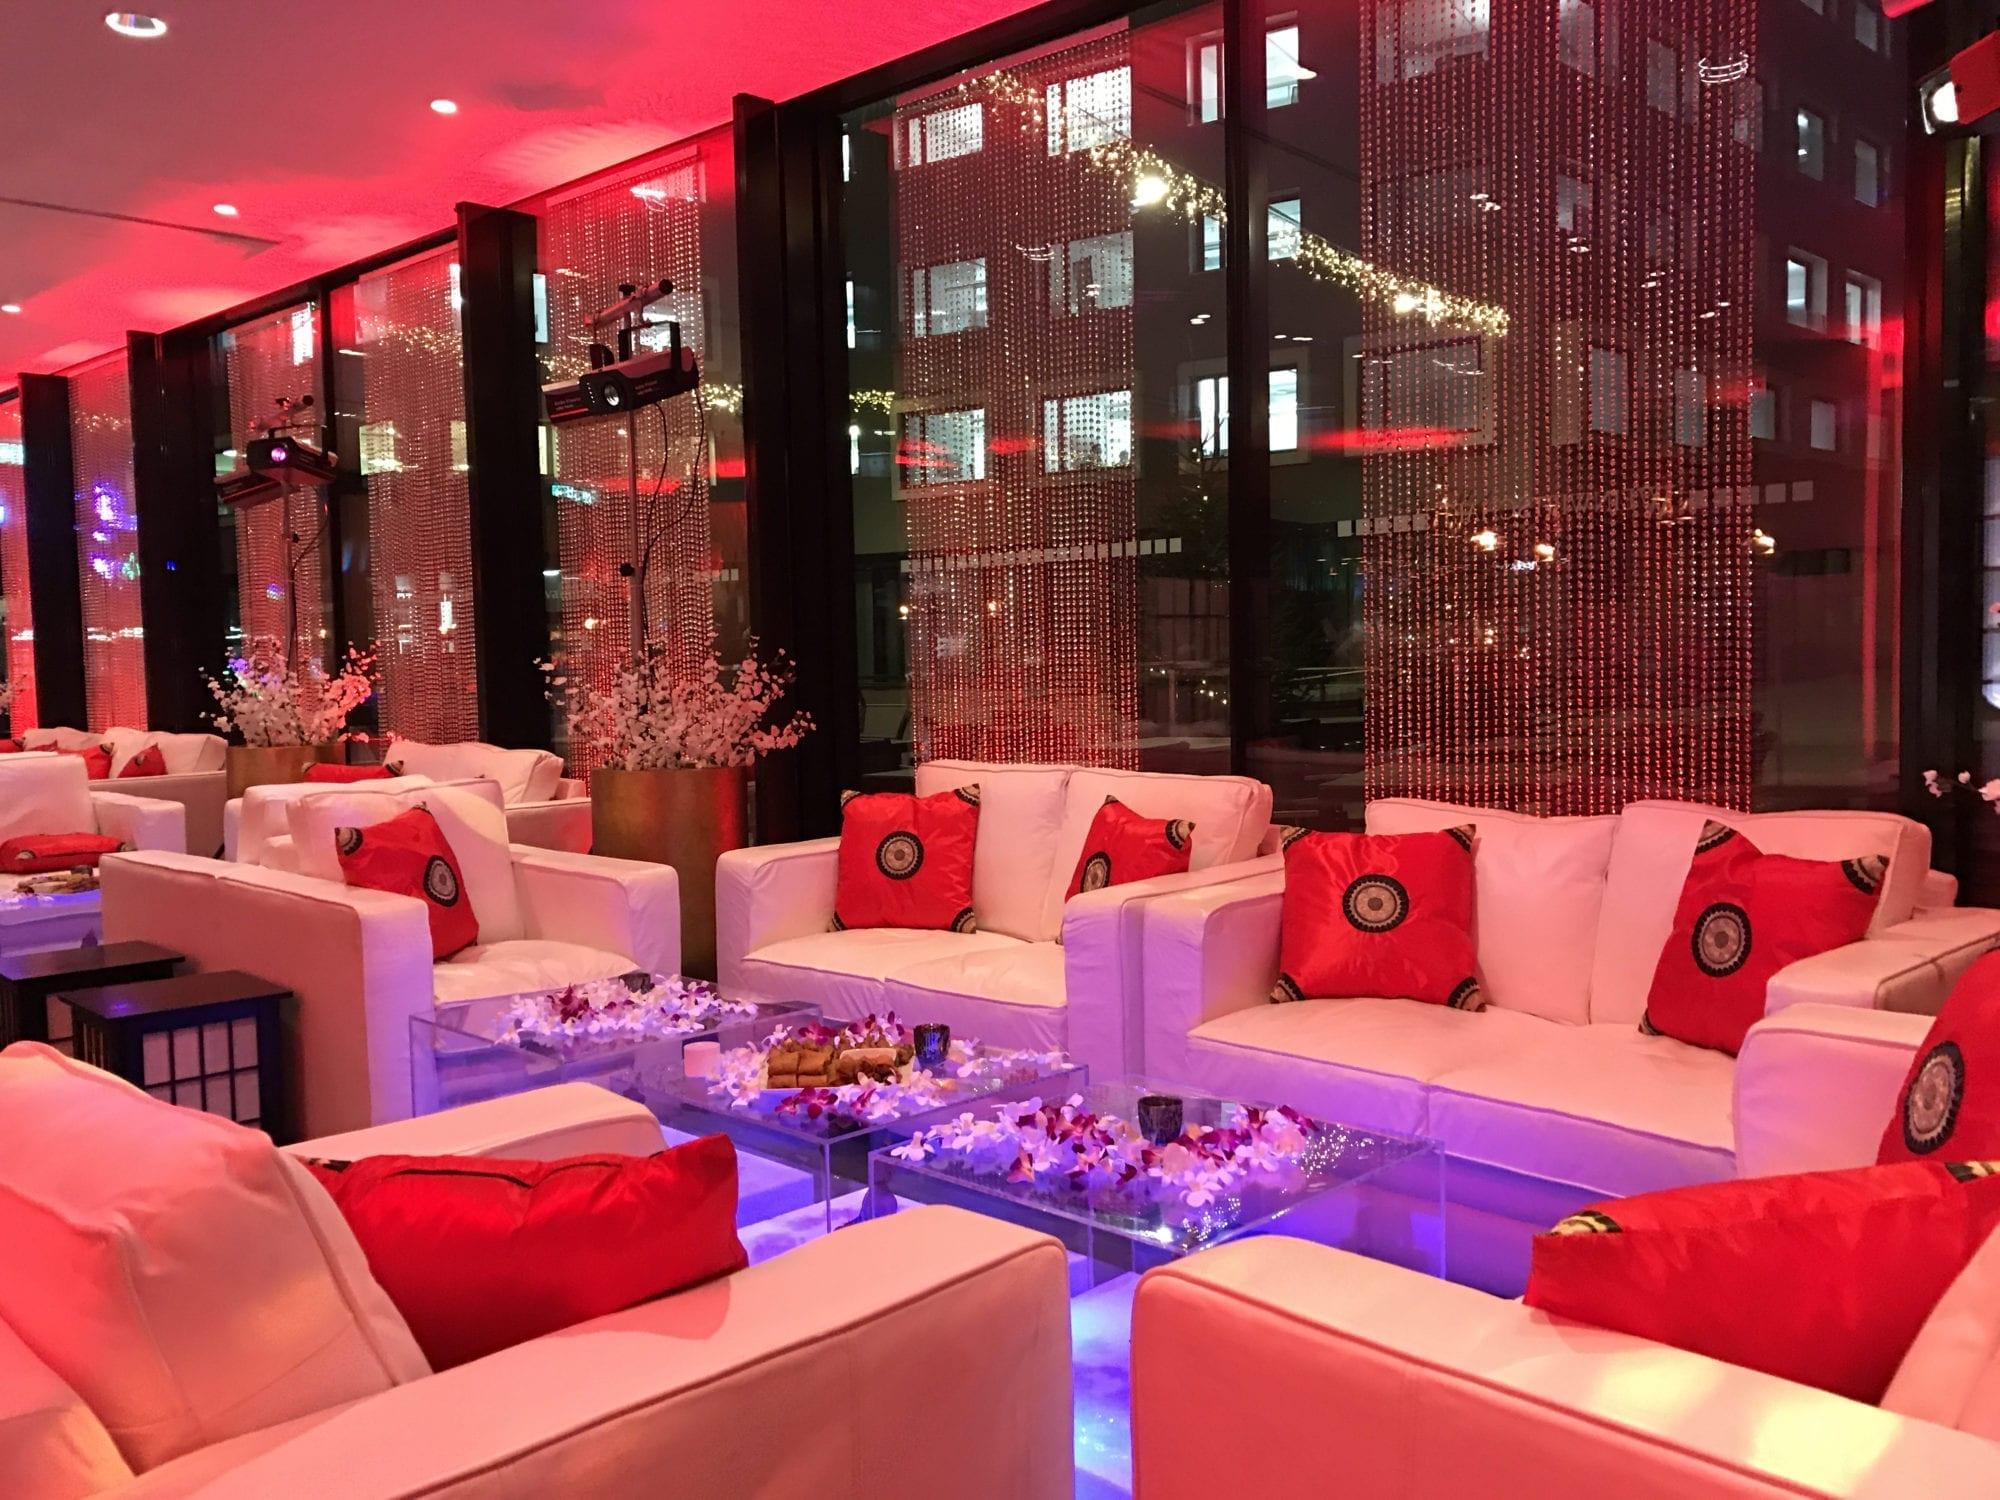 dekokissen style mieten rent-a-lounge 6